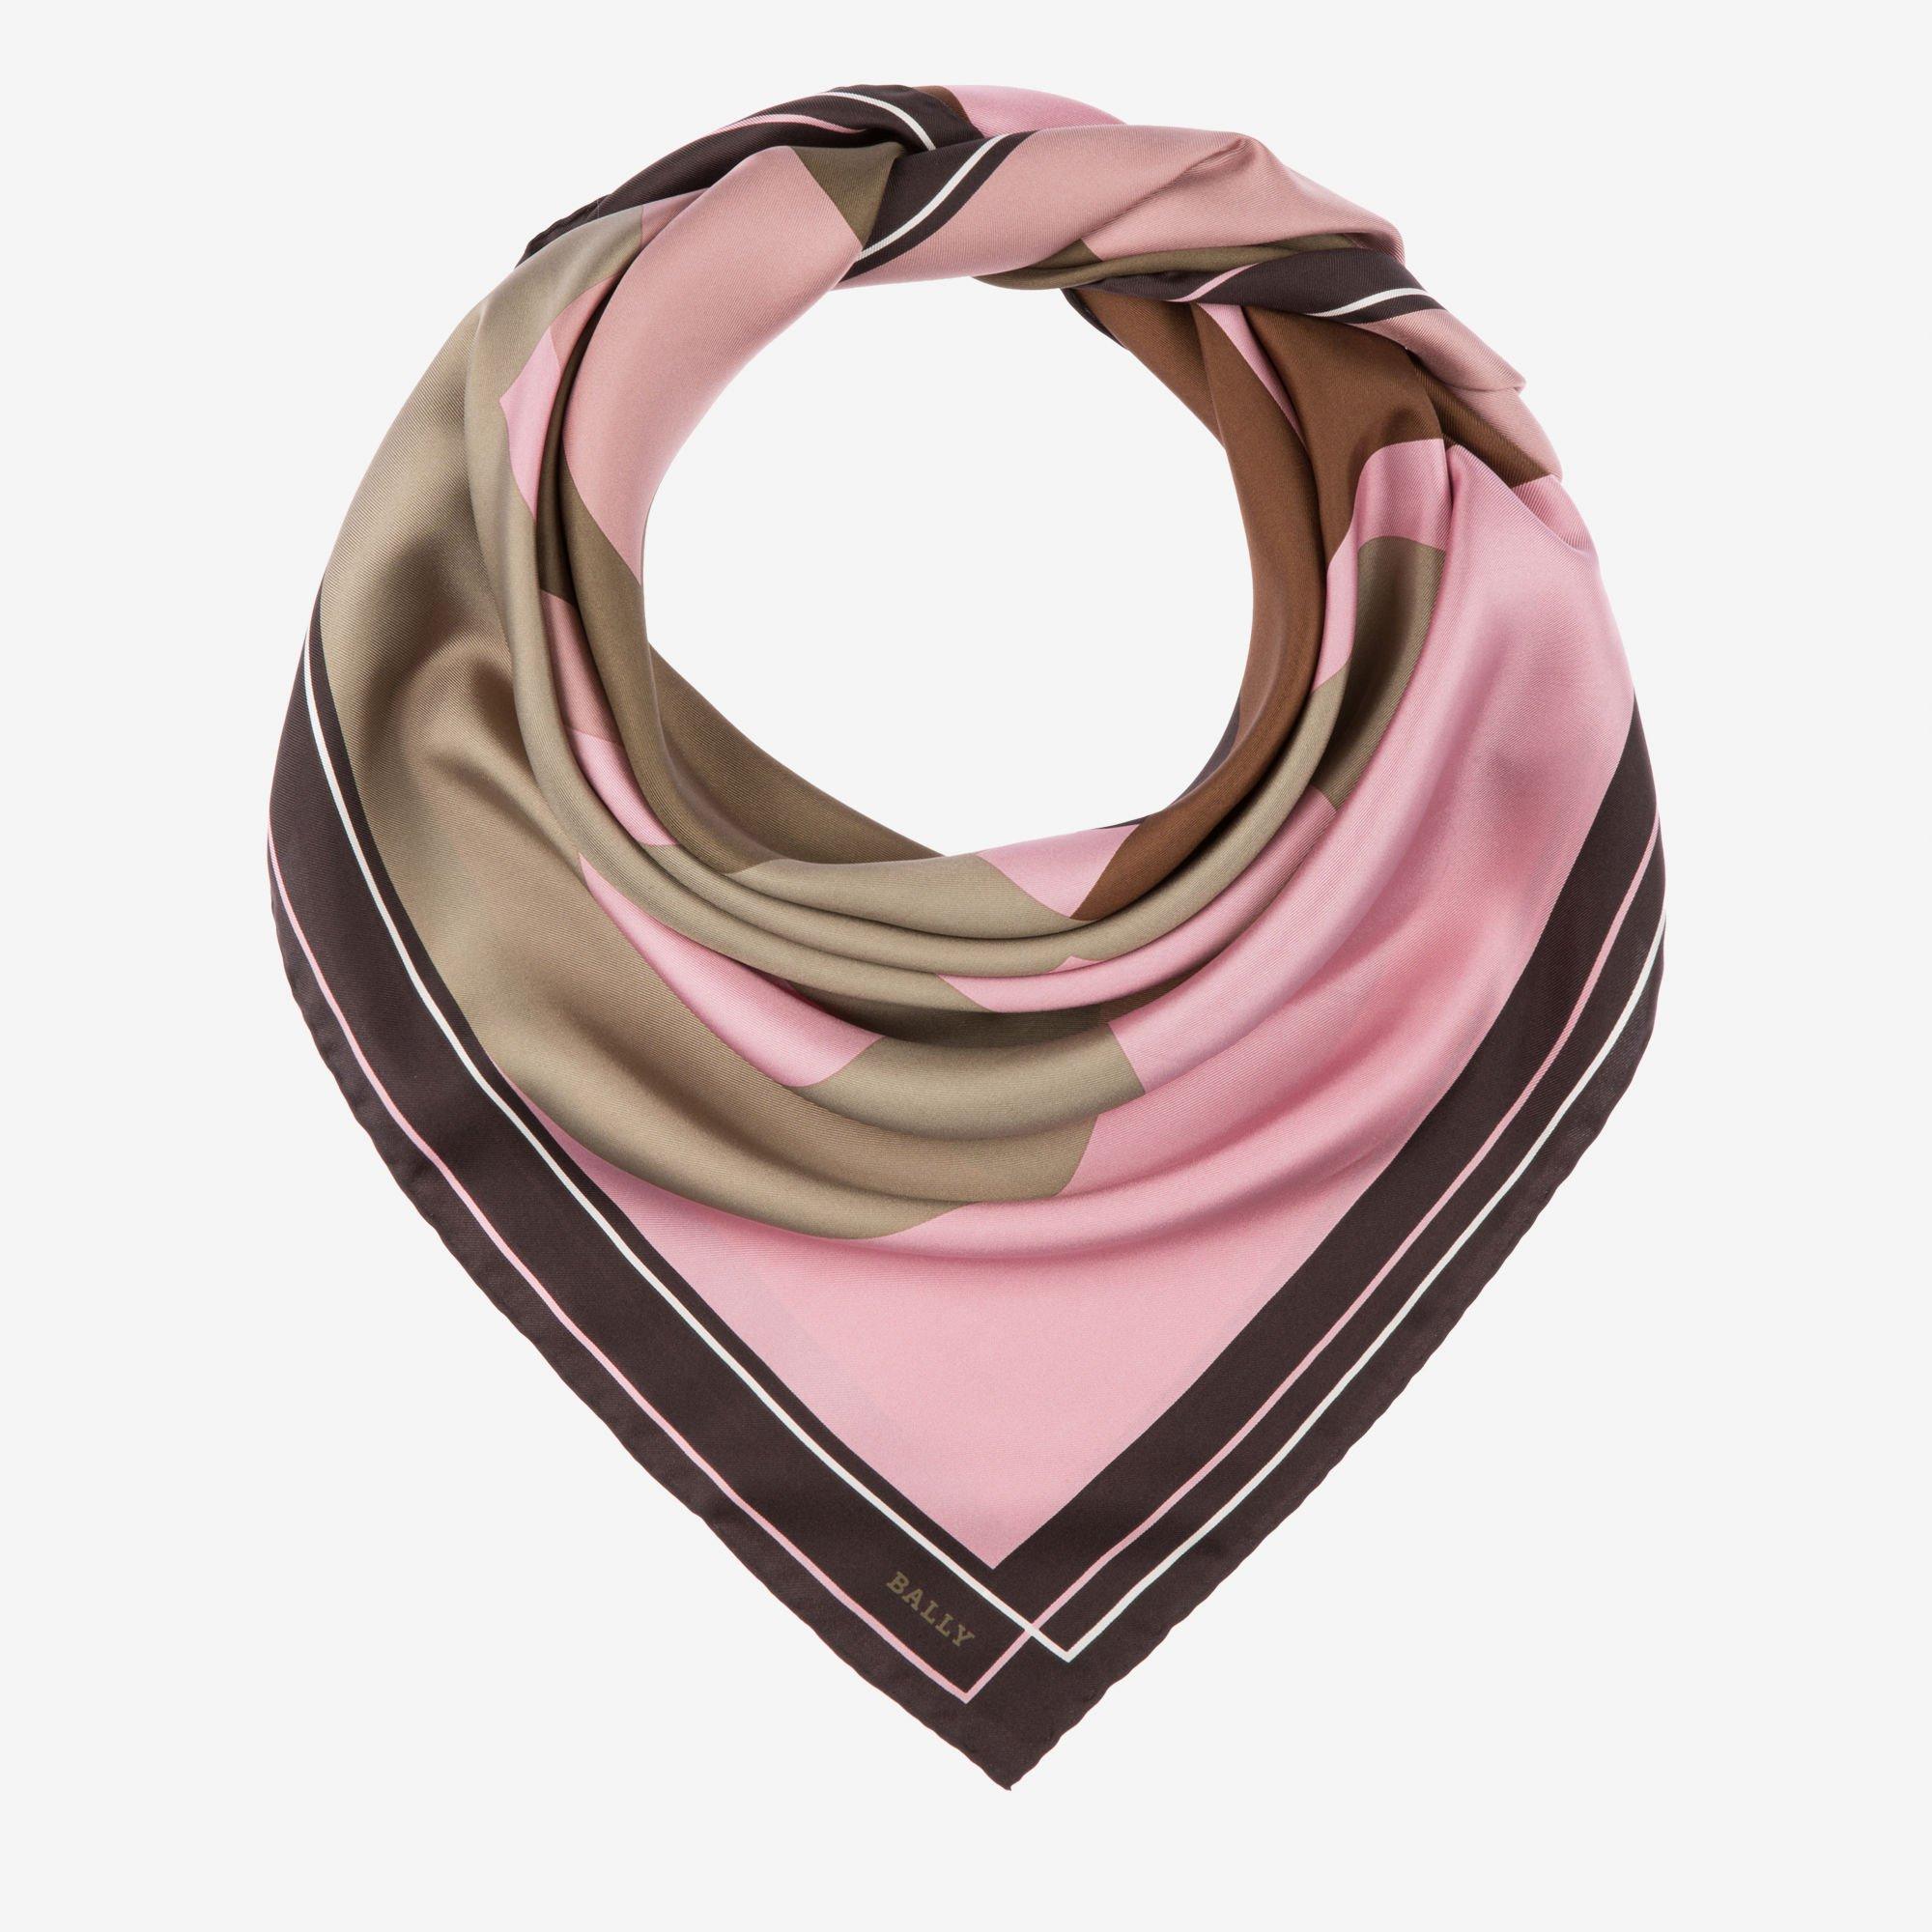 silk scarf pink mix wool/silk - bally etvnhys